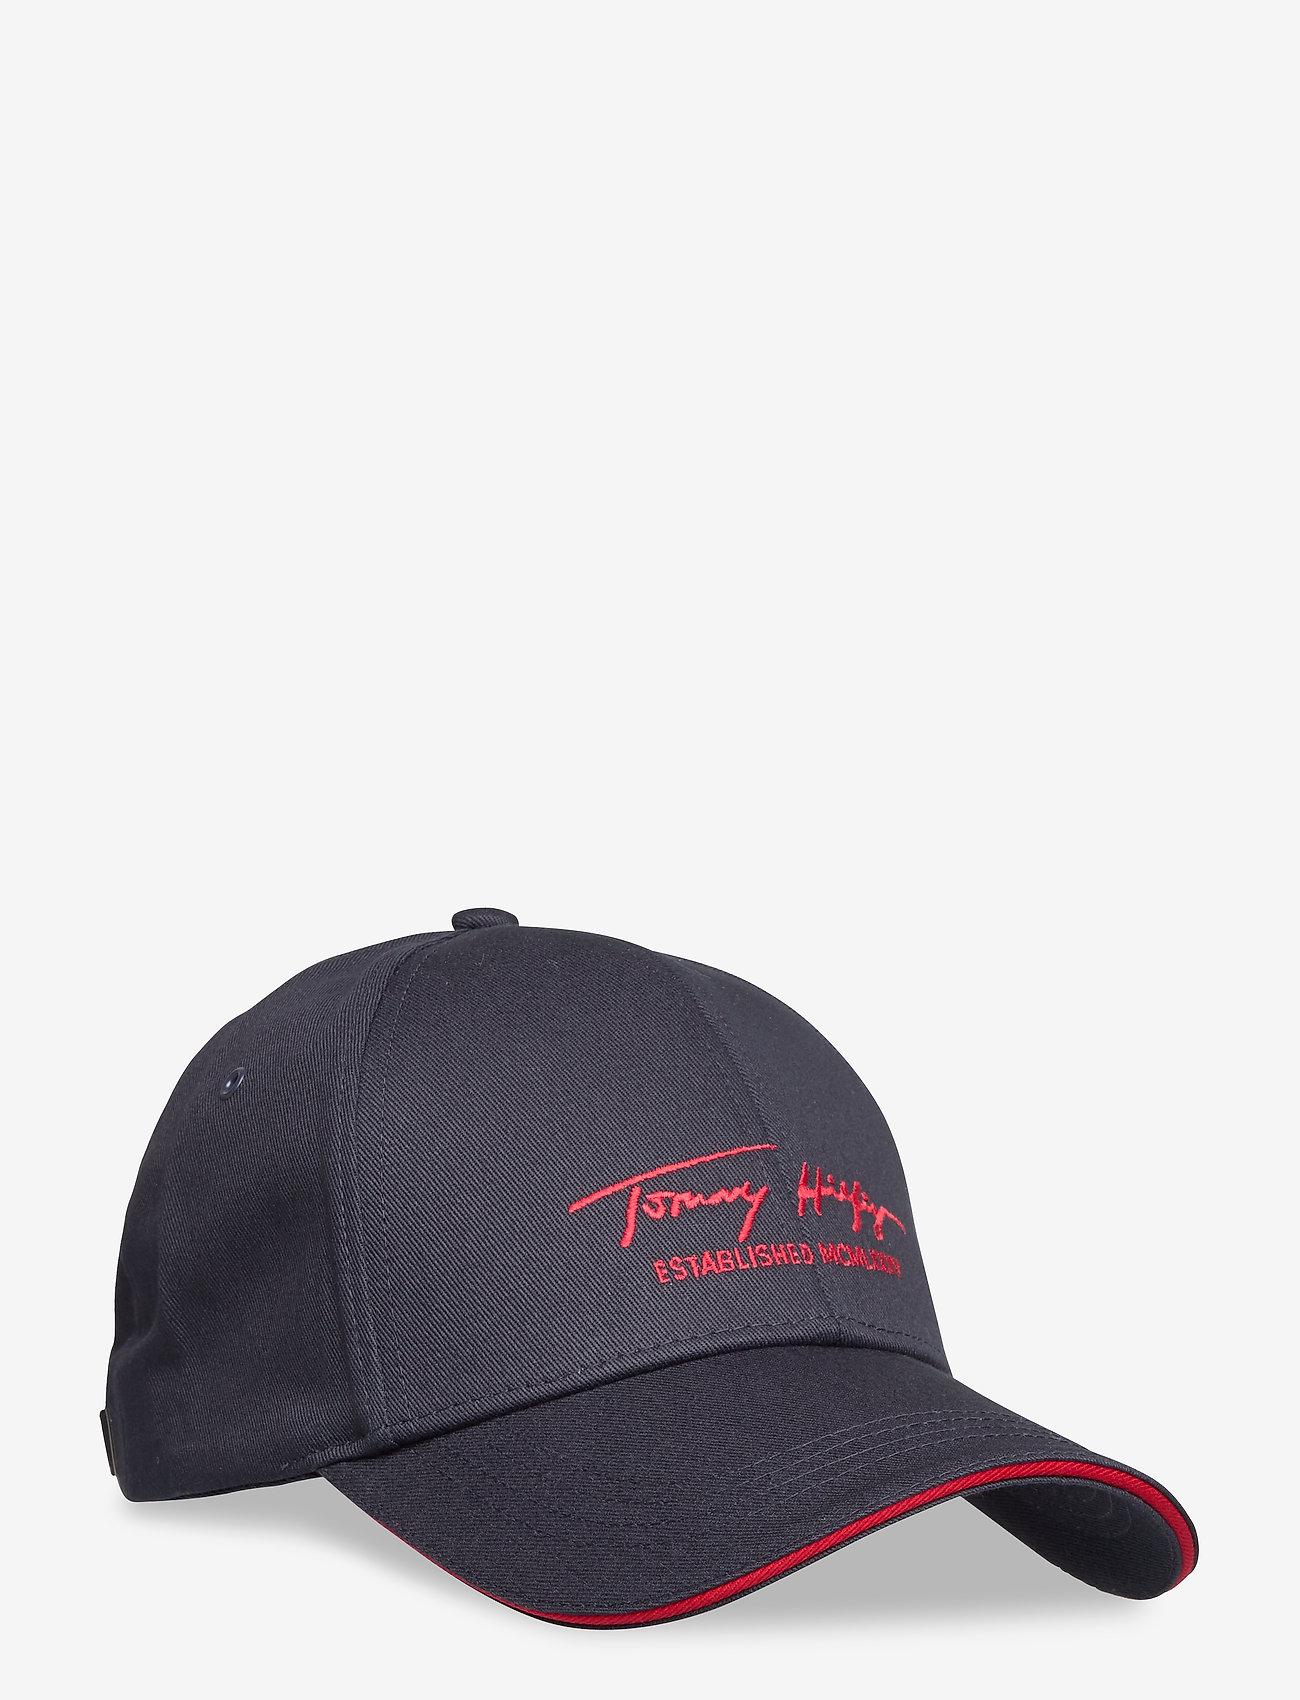 Tommy Hilfiger - TH SIGNATURE CAP - casquettes - sky captain - 0